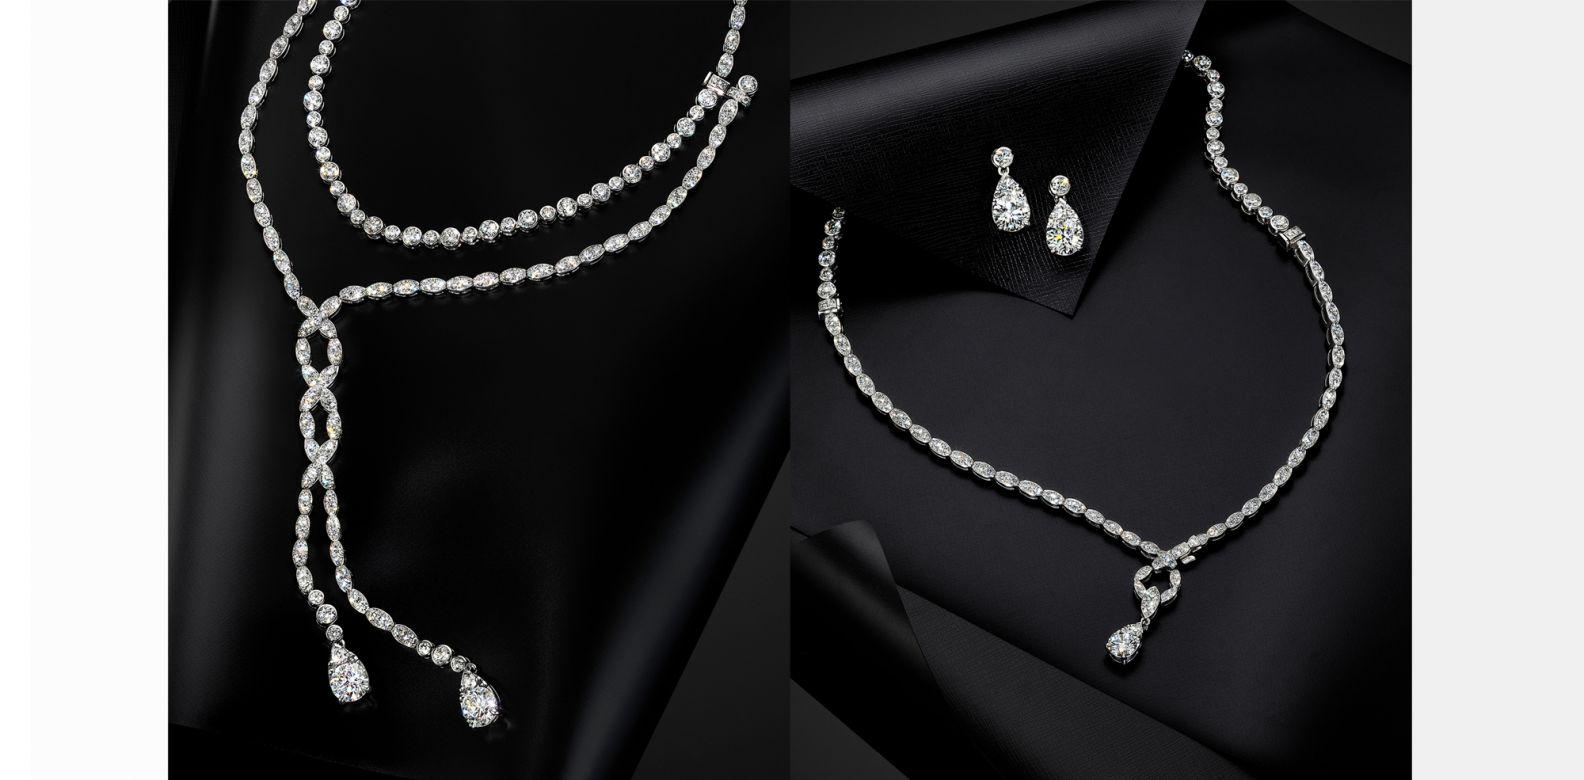 Lorelei Floral Convertible  可轉換式鑽石項鍊/耳環。(圖片提供/Hearts On Fire)